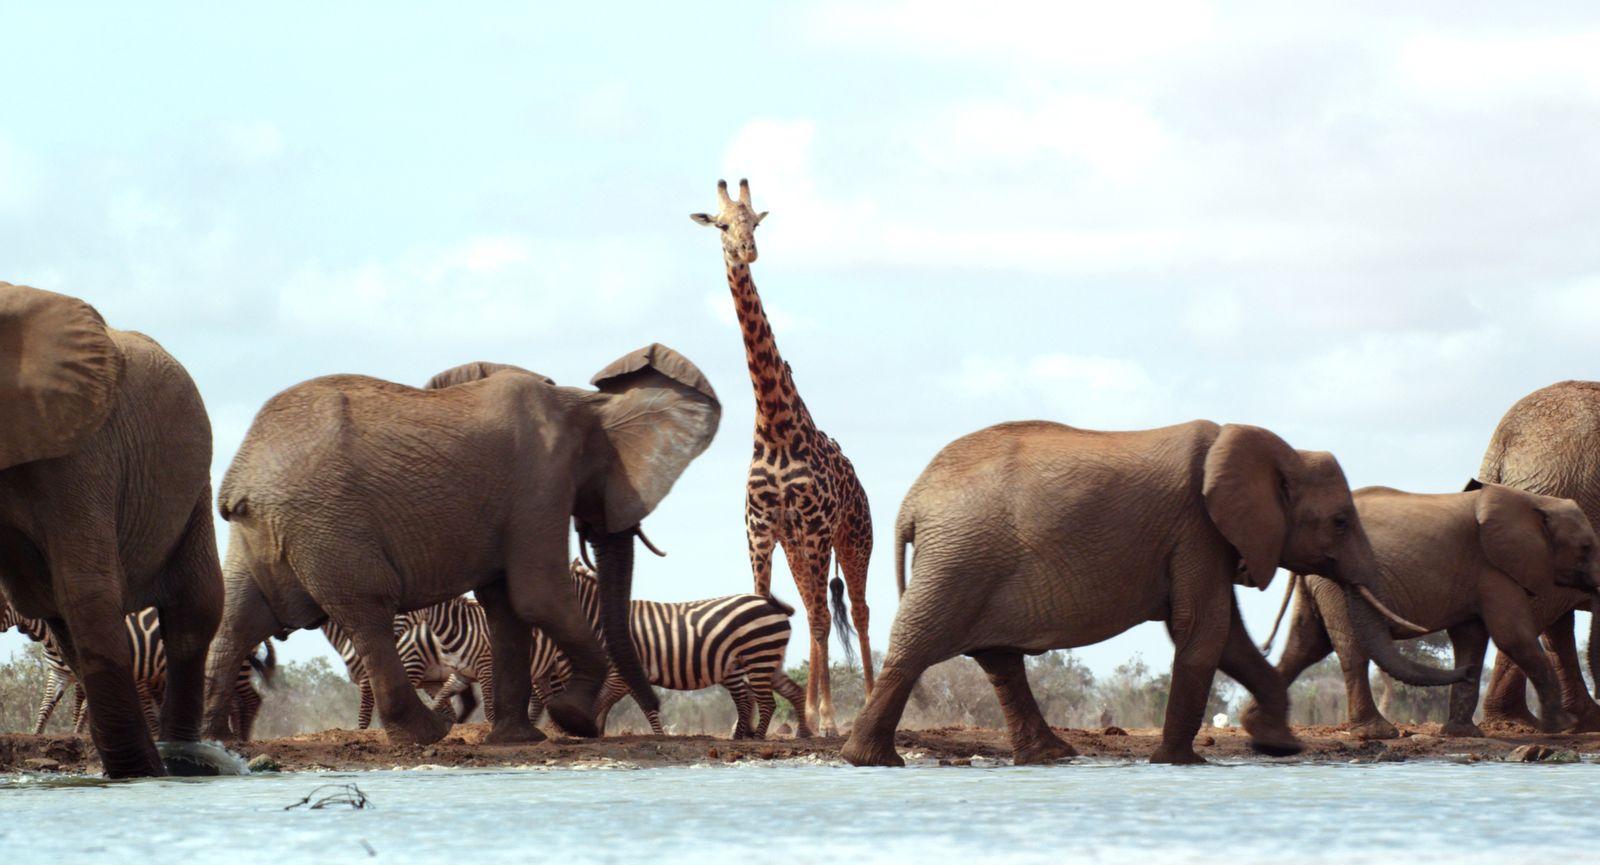 EINMALIGE VERWENDUNG TV/ The Elephant Queen